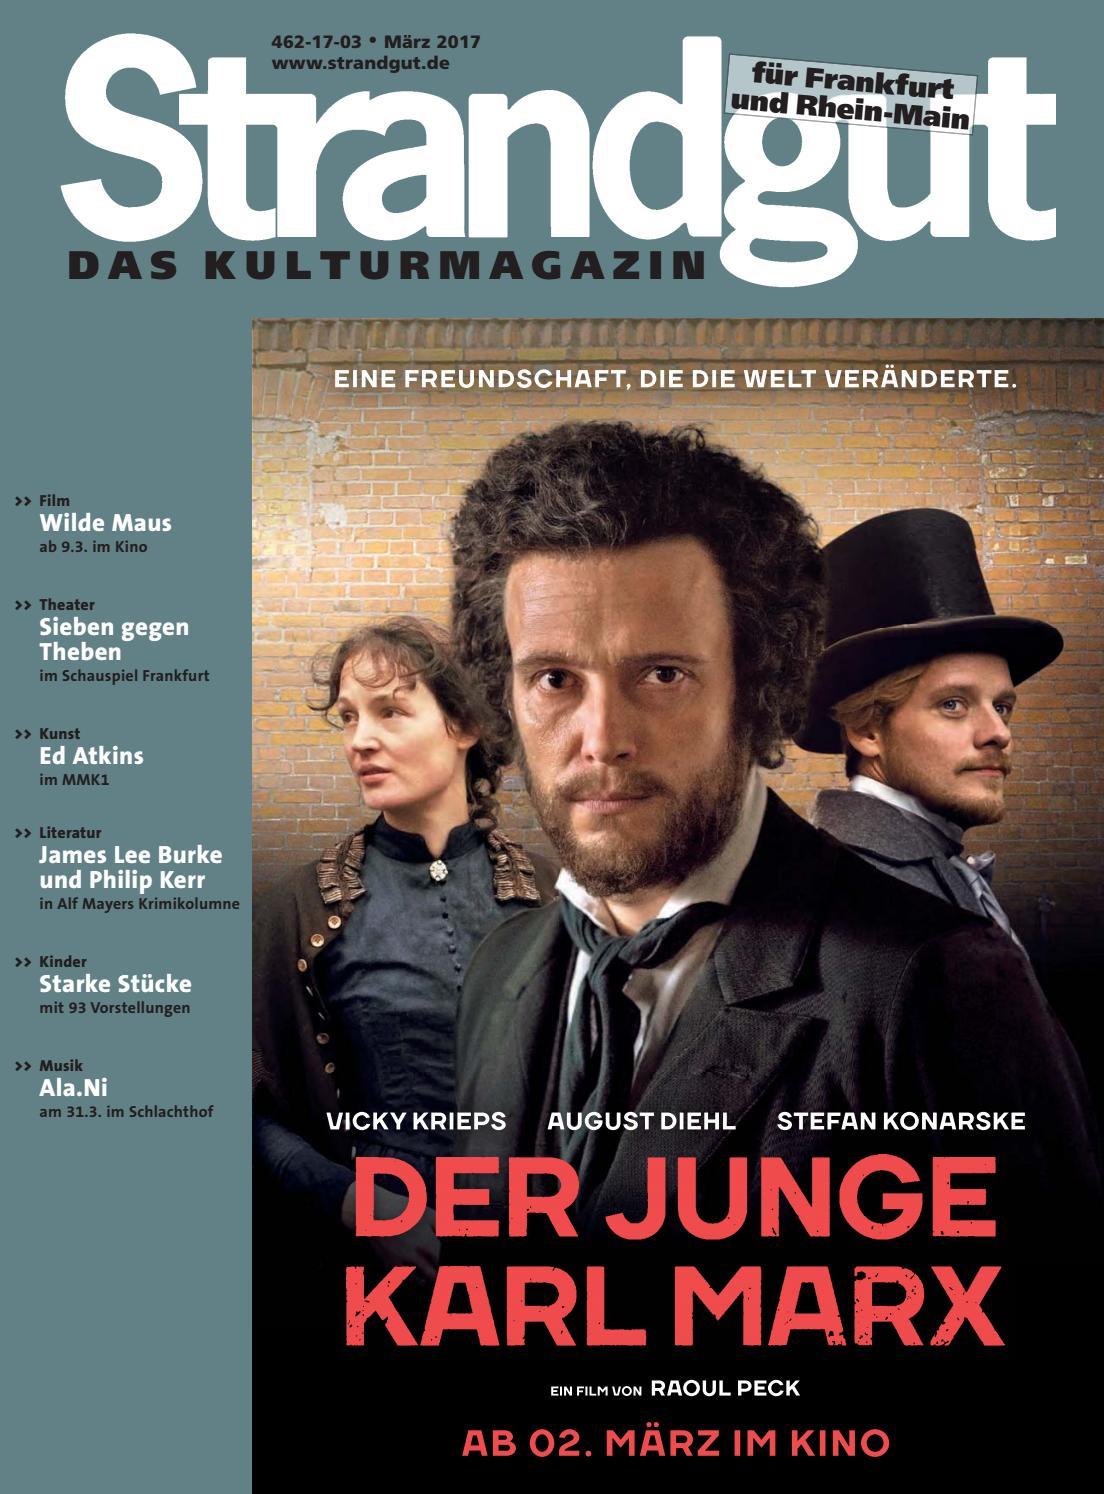 Strandgut 3/2017 by Strandgut Kulturmagazin - issuu